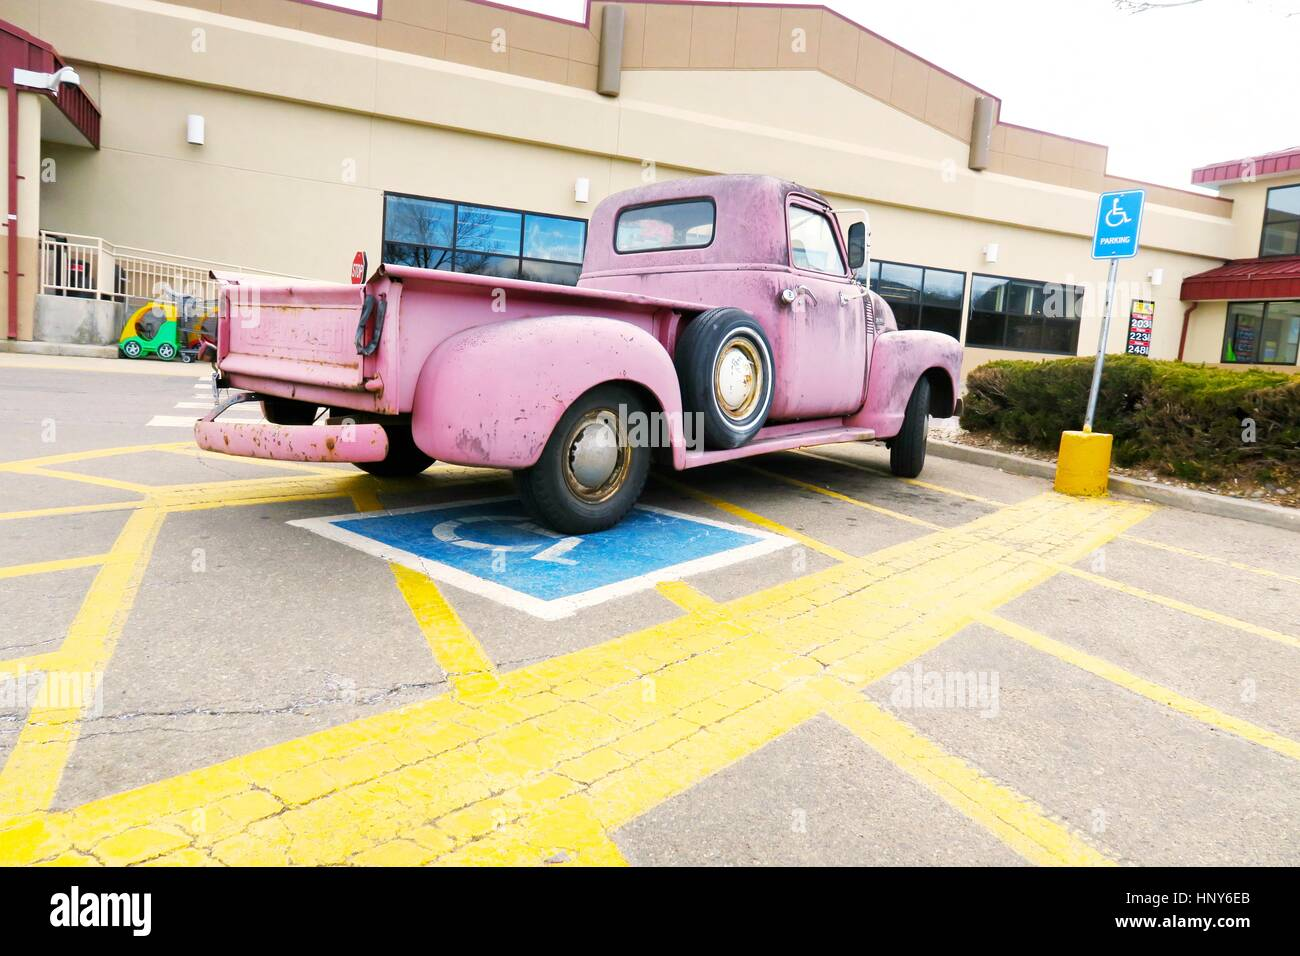 pink truck memorabilia Stock Photo: 133978163 - Alamy